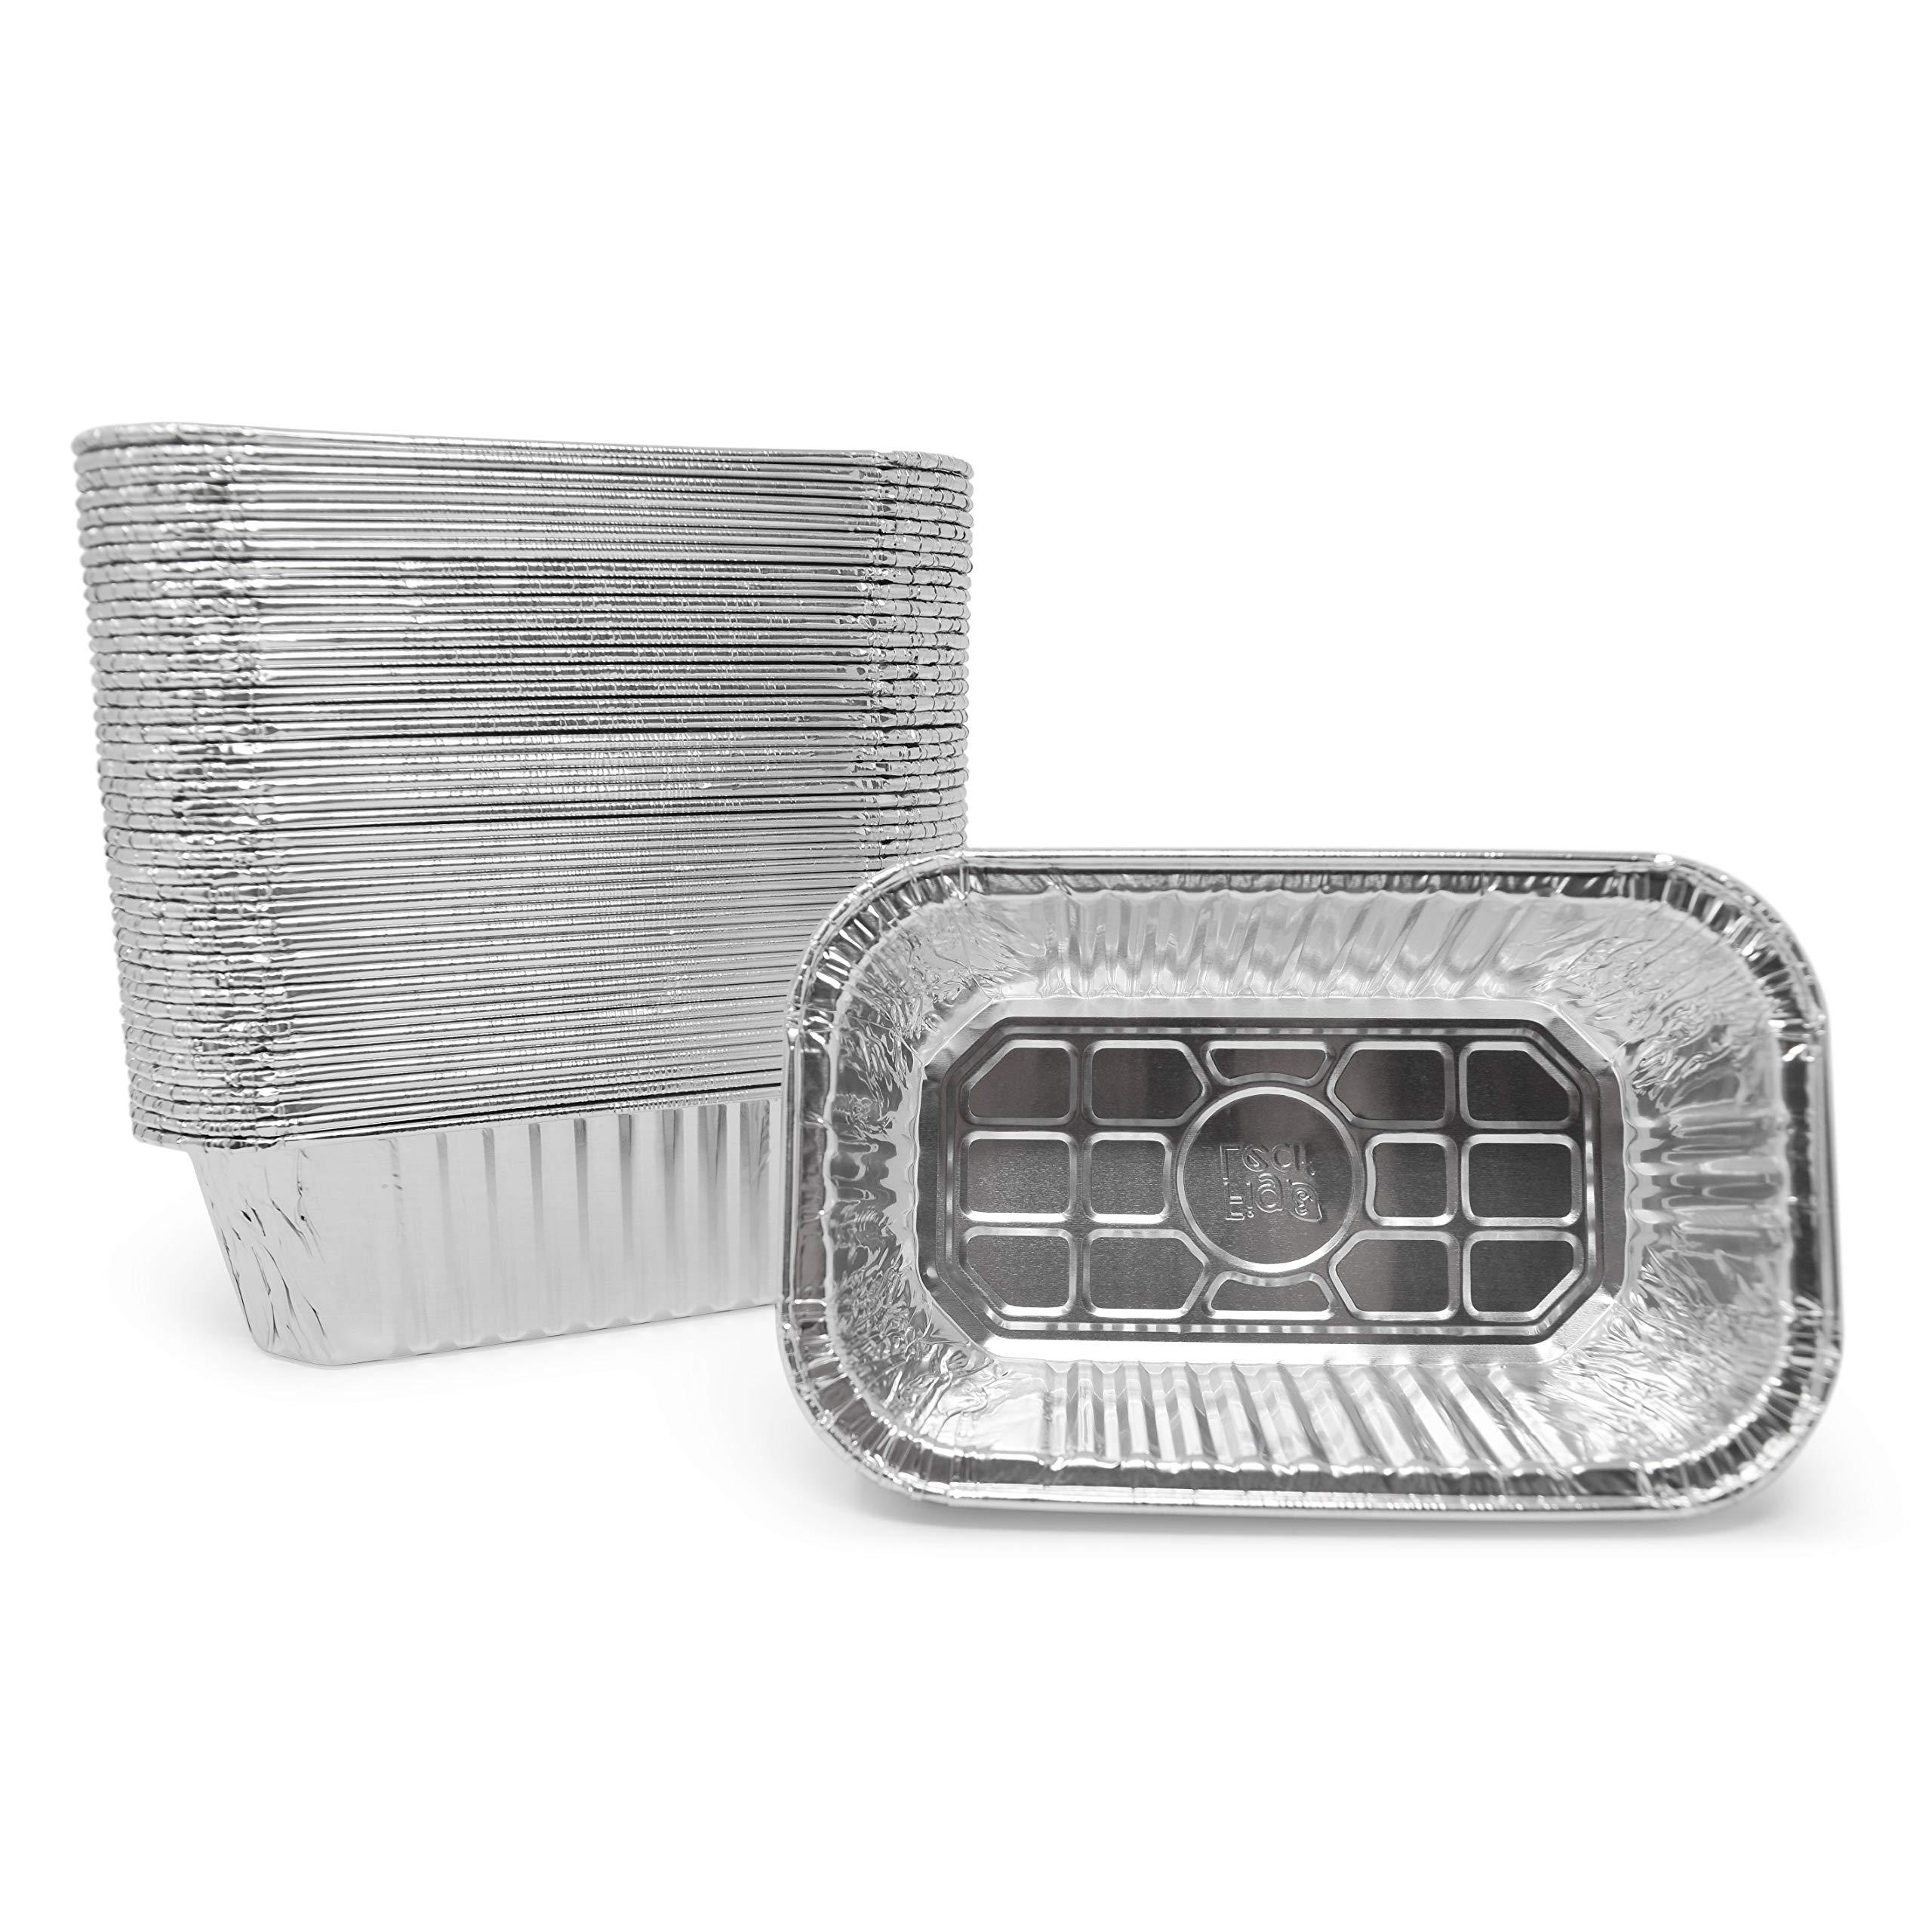 (60 Pack) Premium 1-LB Loaf Baking Pans - Mini Size 6.1'' x 3.7'' x 2.0'' l Top Baker's Choice Aluminum Foil by Fig and Leaf